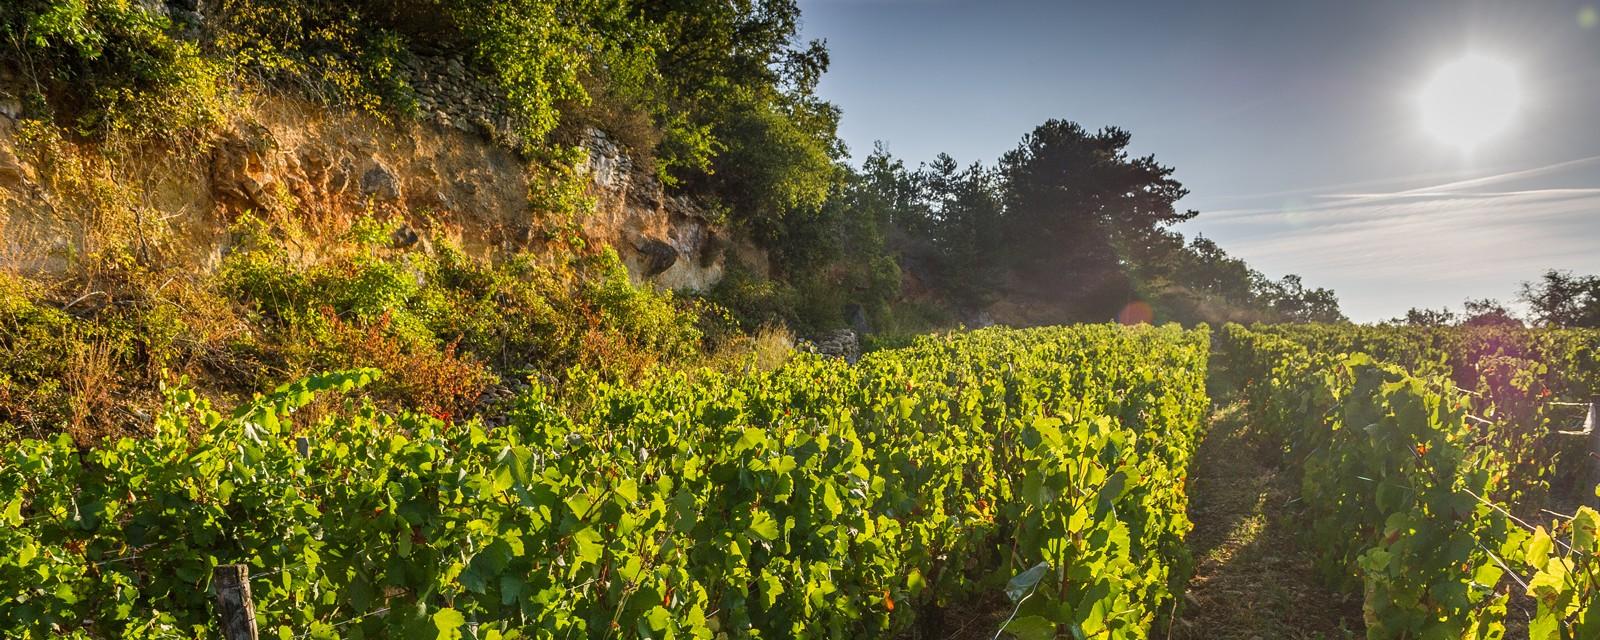 Sunny Vineyard